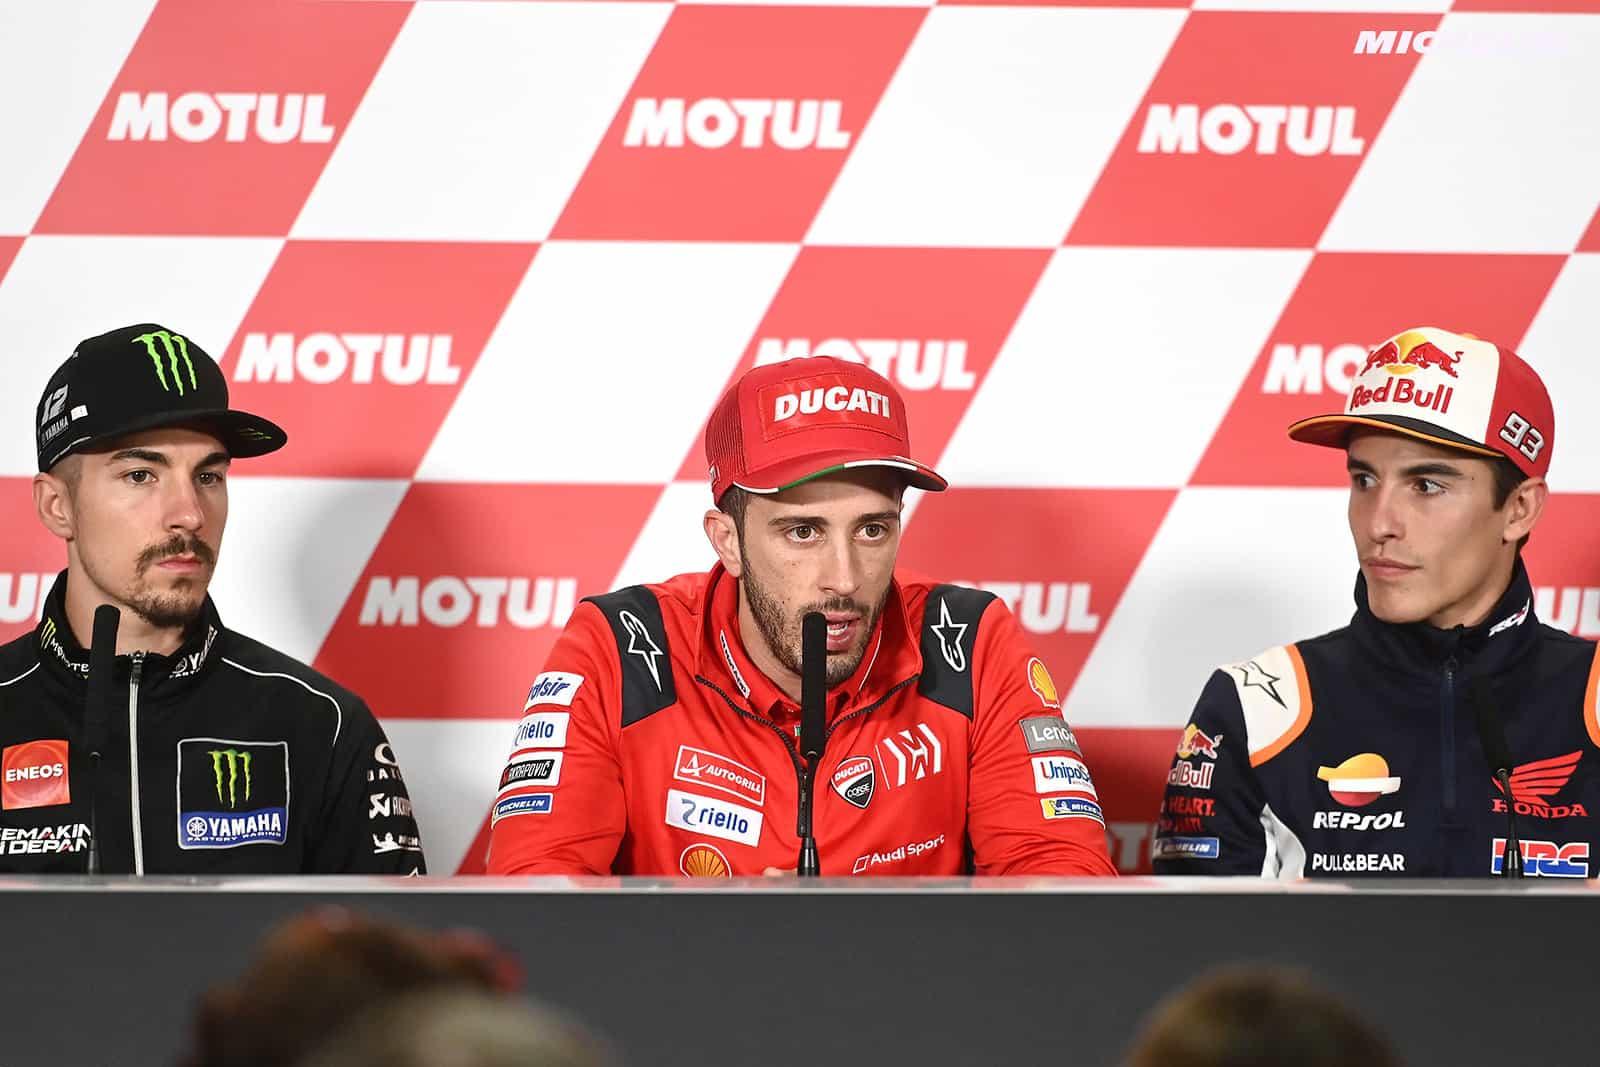 MotoGP2019日本GP ドヴィツィオーゾ「旋回性の改善を引き続き続ける必要がある」